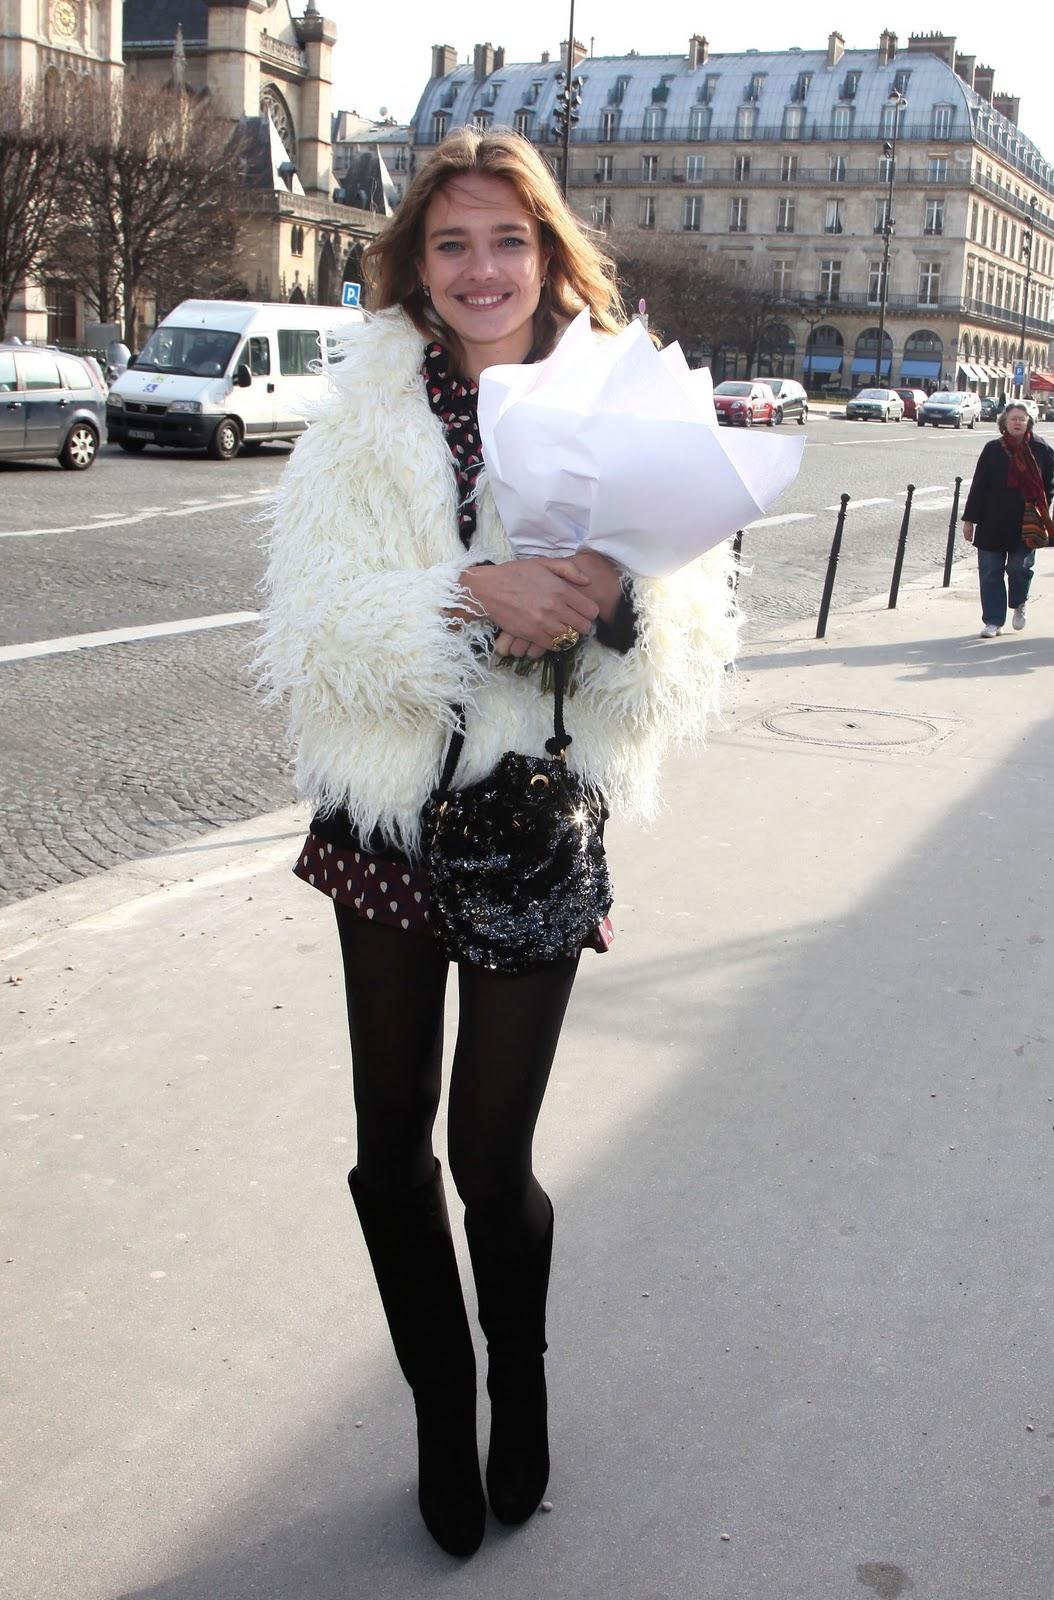 http://1.bp.blogspot.com/-qvwgpDmYPhk/TZh6NJr5_VI/AAAAAAAAINE/57TVd_klcIQ/s1600/59306-celebrity-paradise-com-the-nataliavodianova2.jpg